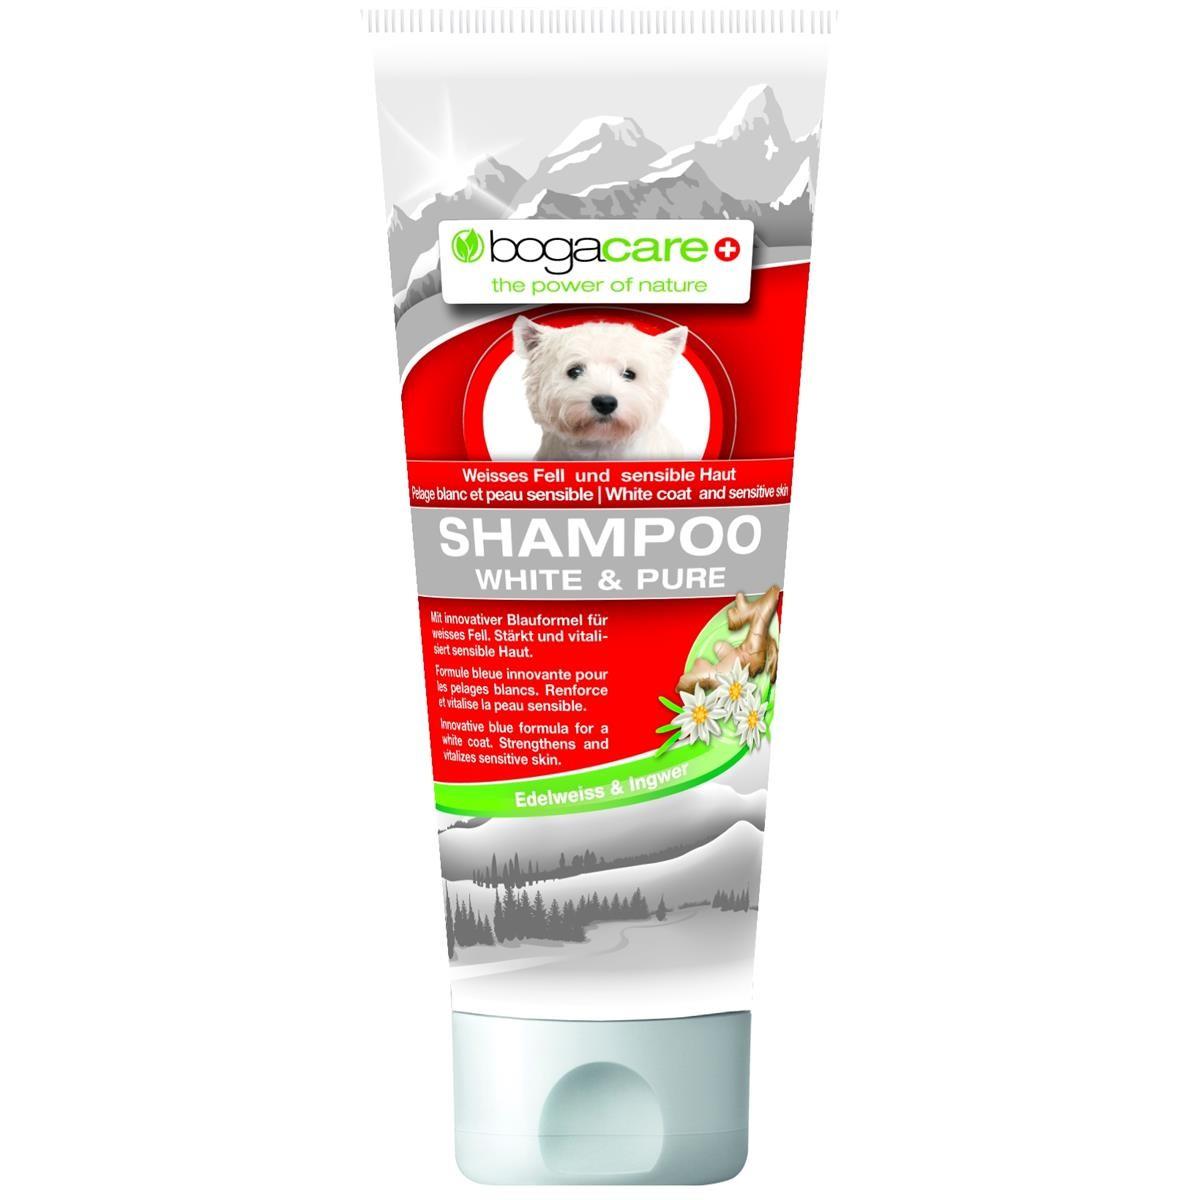 bogacare Shampoo White & Pure 200ml aufhellendes Shampoo für Hunde